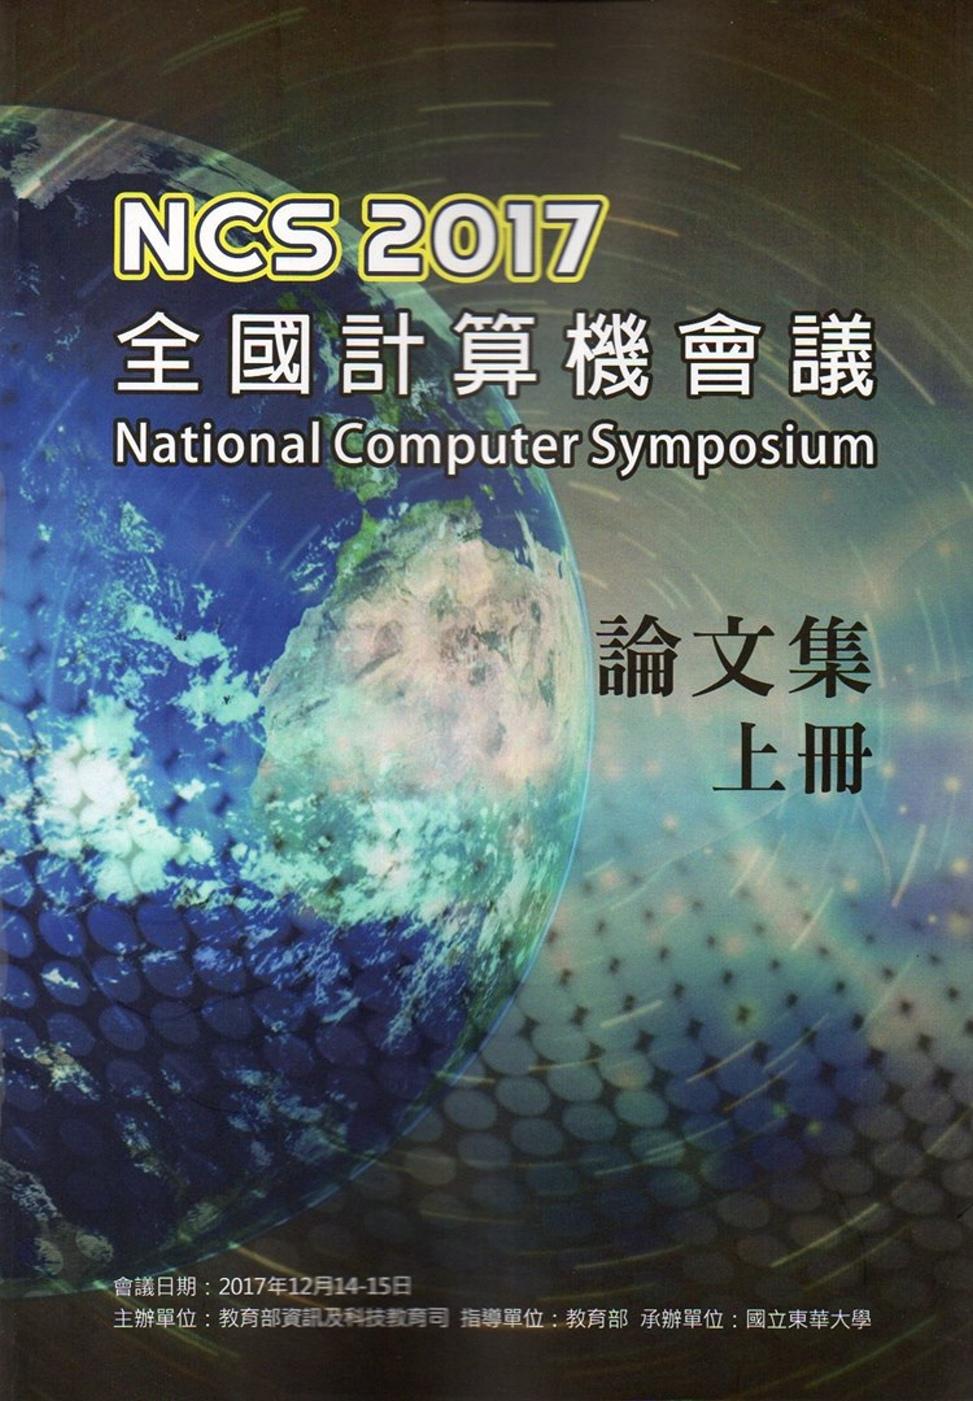 NCS 2017 全國計算機會議(National Computer Symposium)論文集(上下冊)